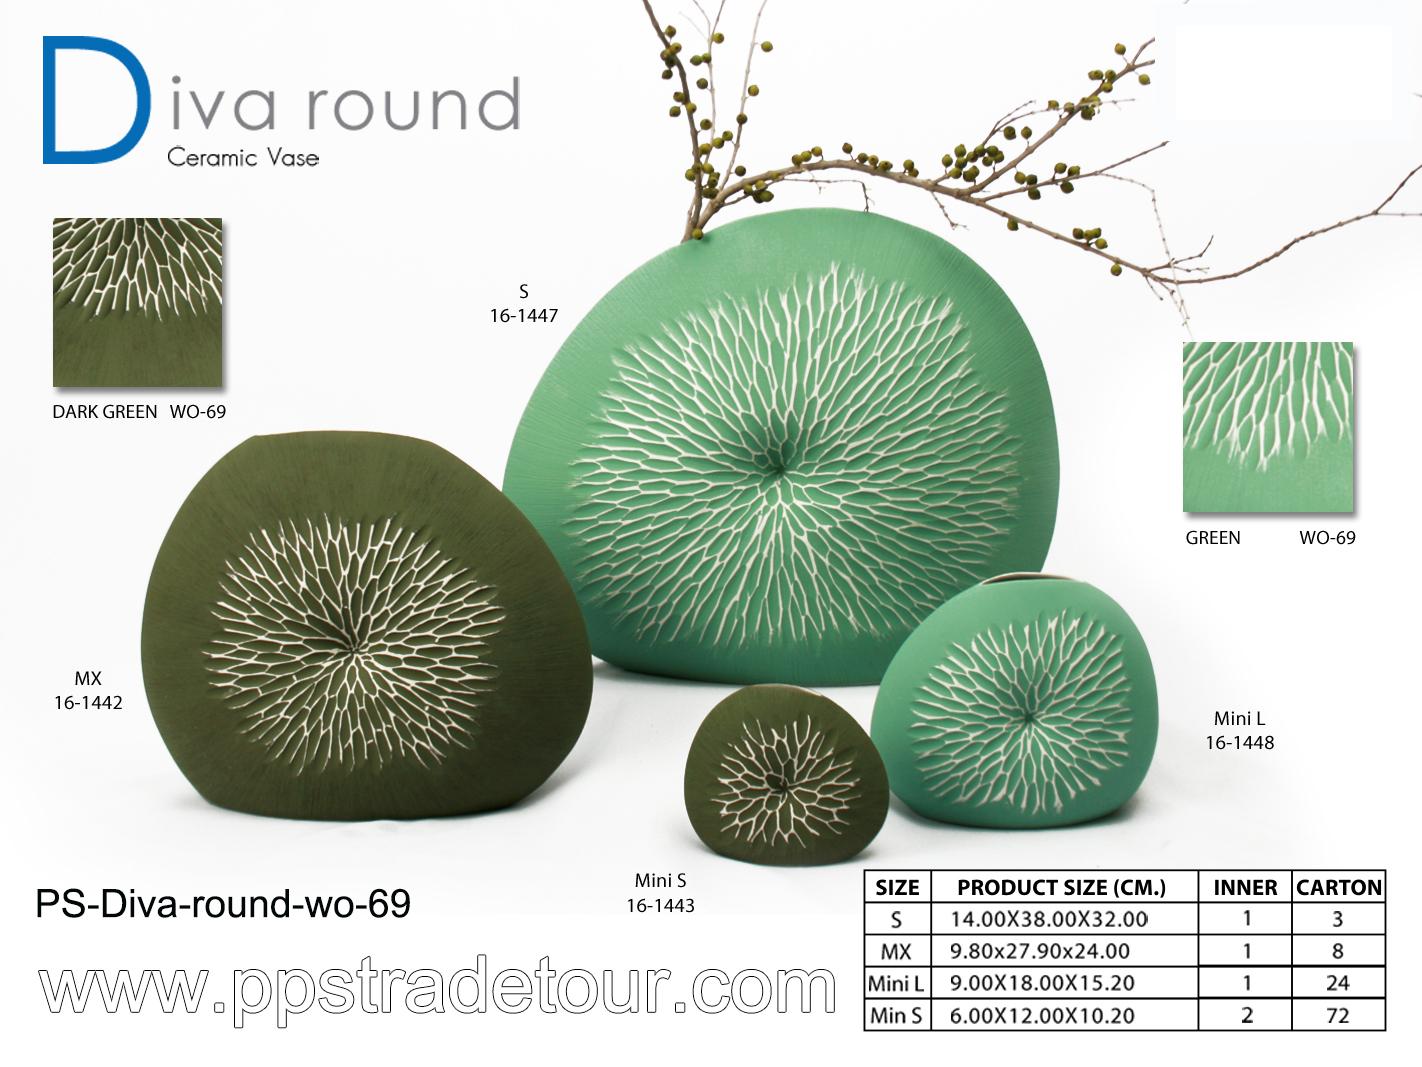 PSCV-Diva-round-wo-69